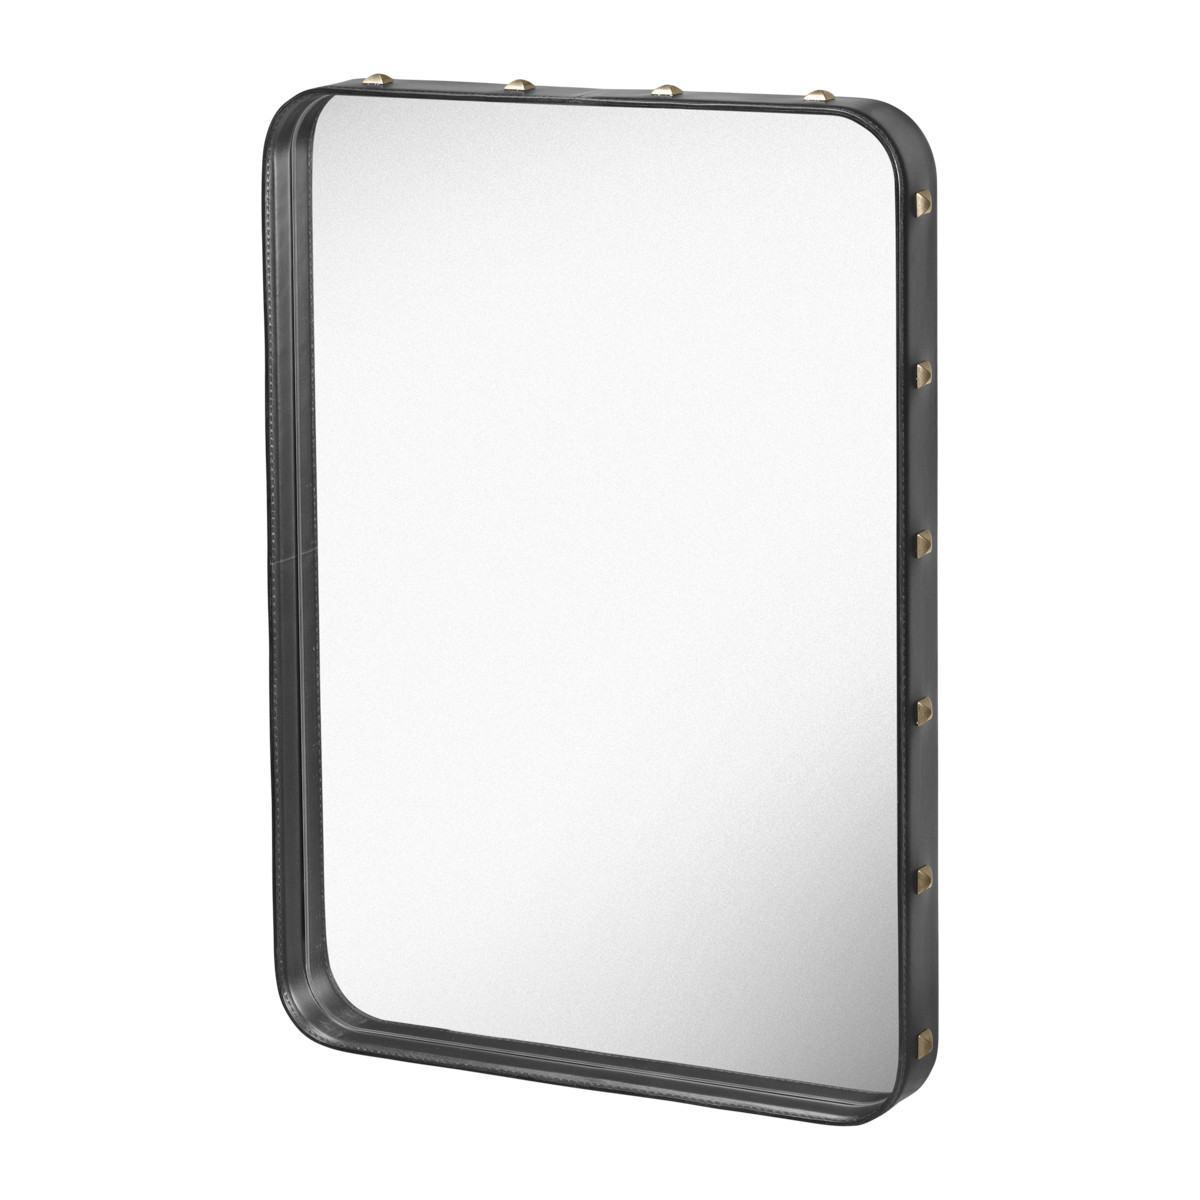 Gubi Adnet Mirror, Rectangular